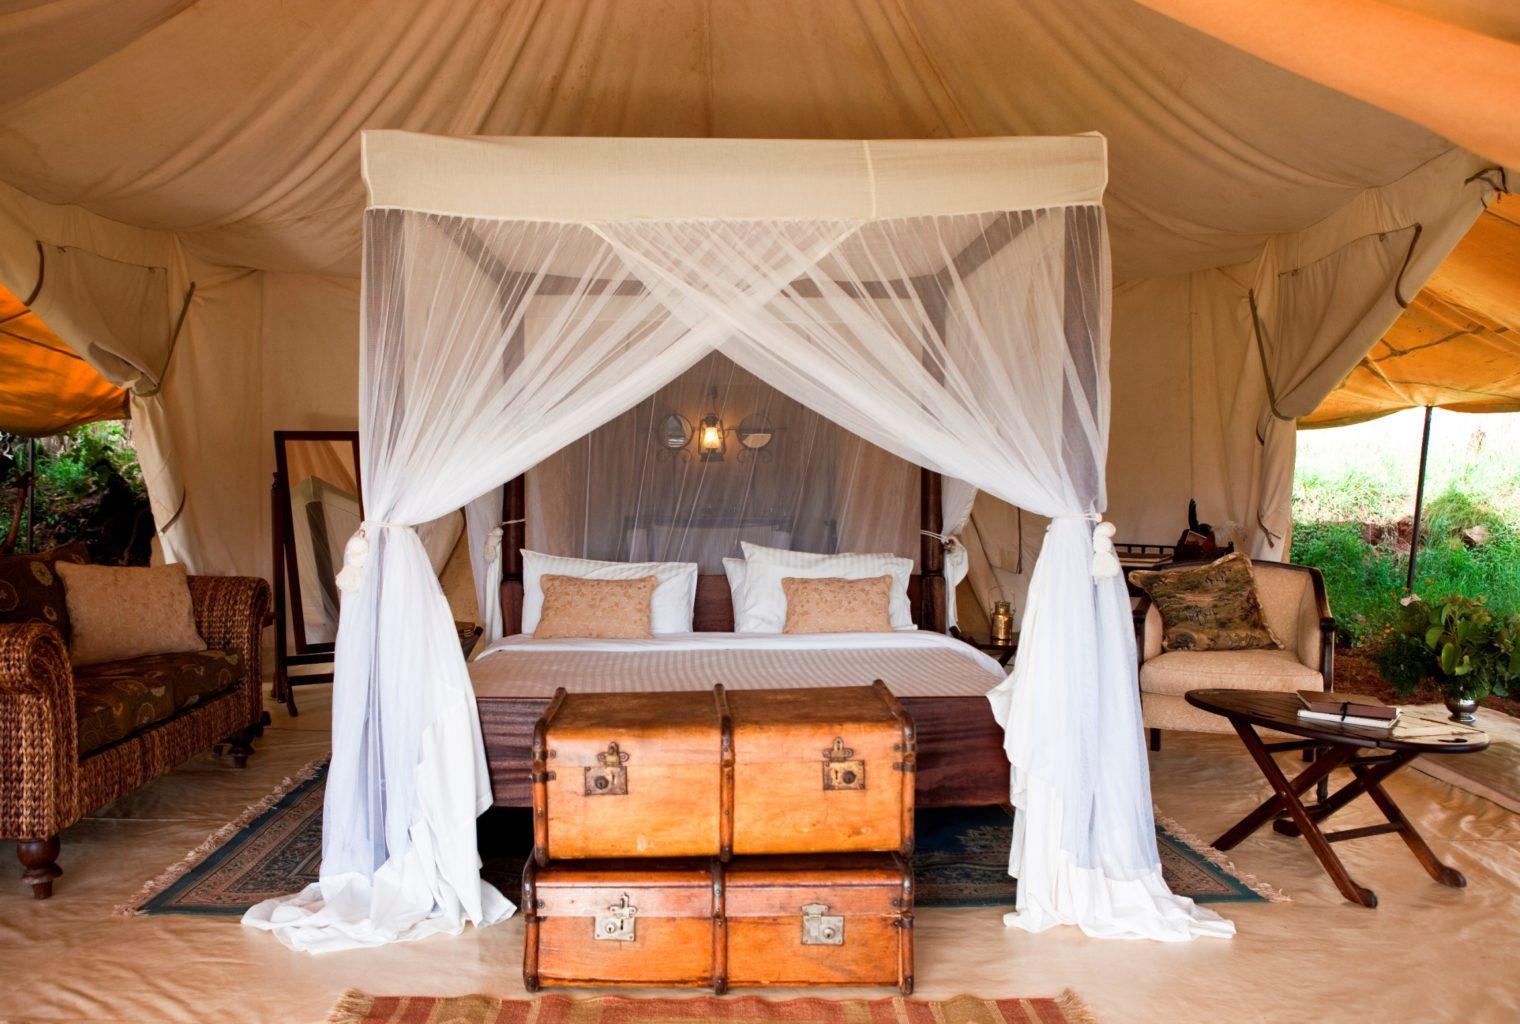 Cottars 1920s Style Kenya Bed